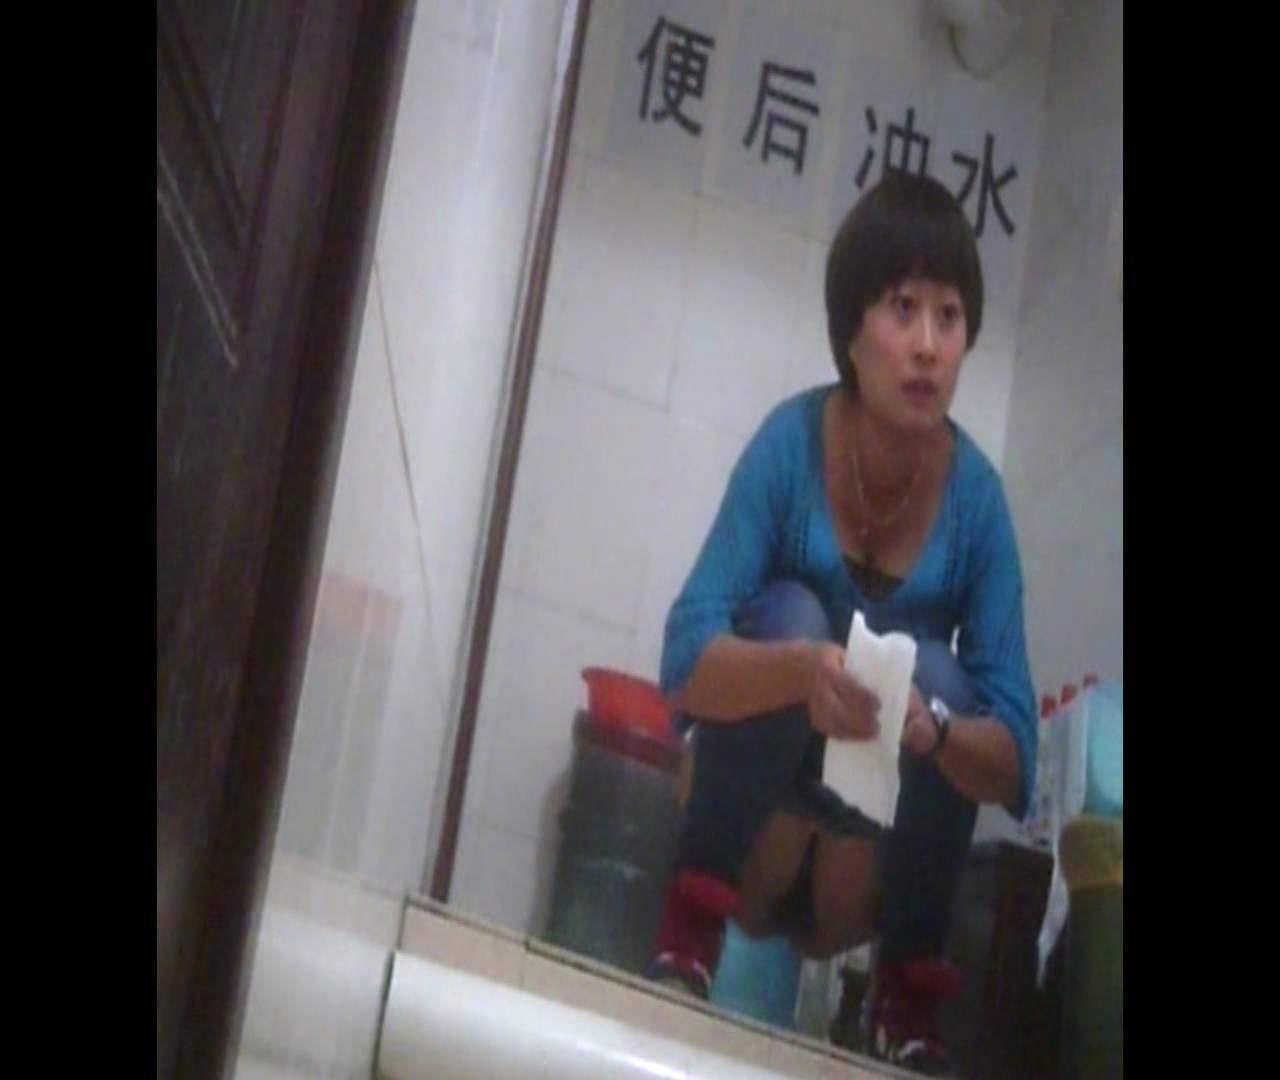 Vol.37 豊満な胸を持つマッシュルームカットな彼女 洗面所のぞき 性交動画流出 109枚 56